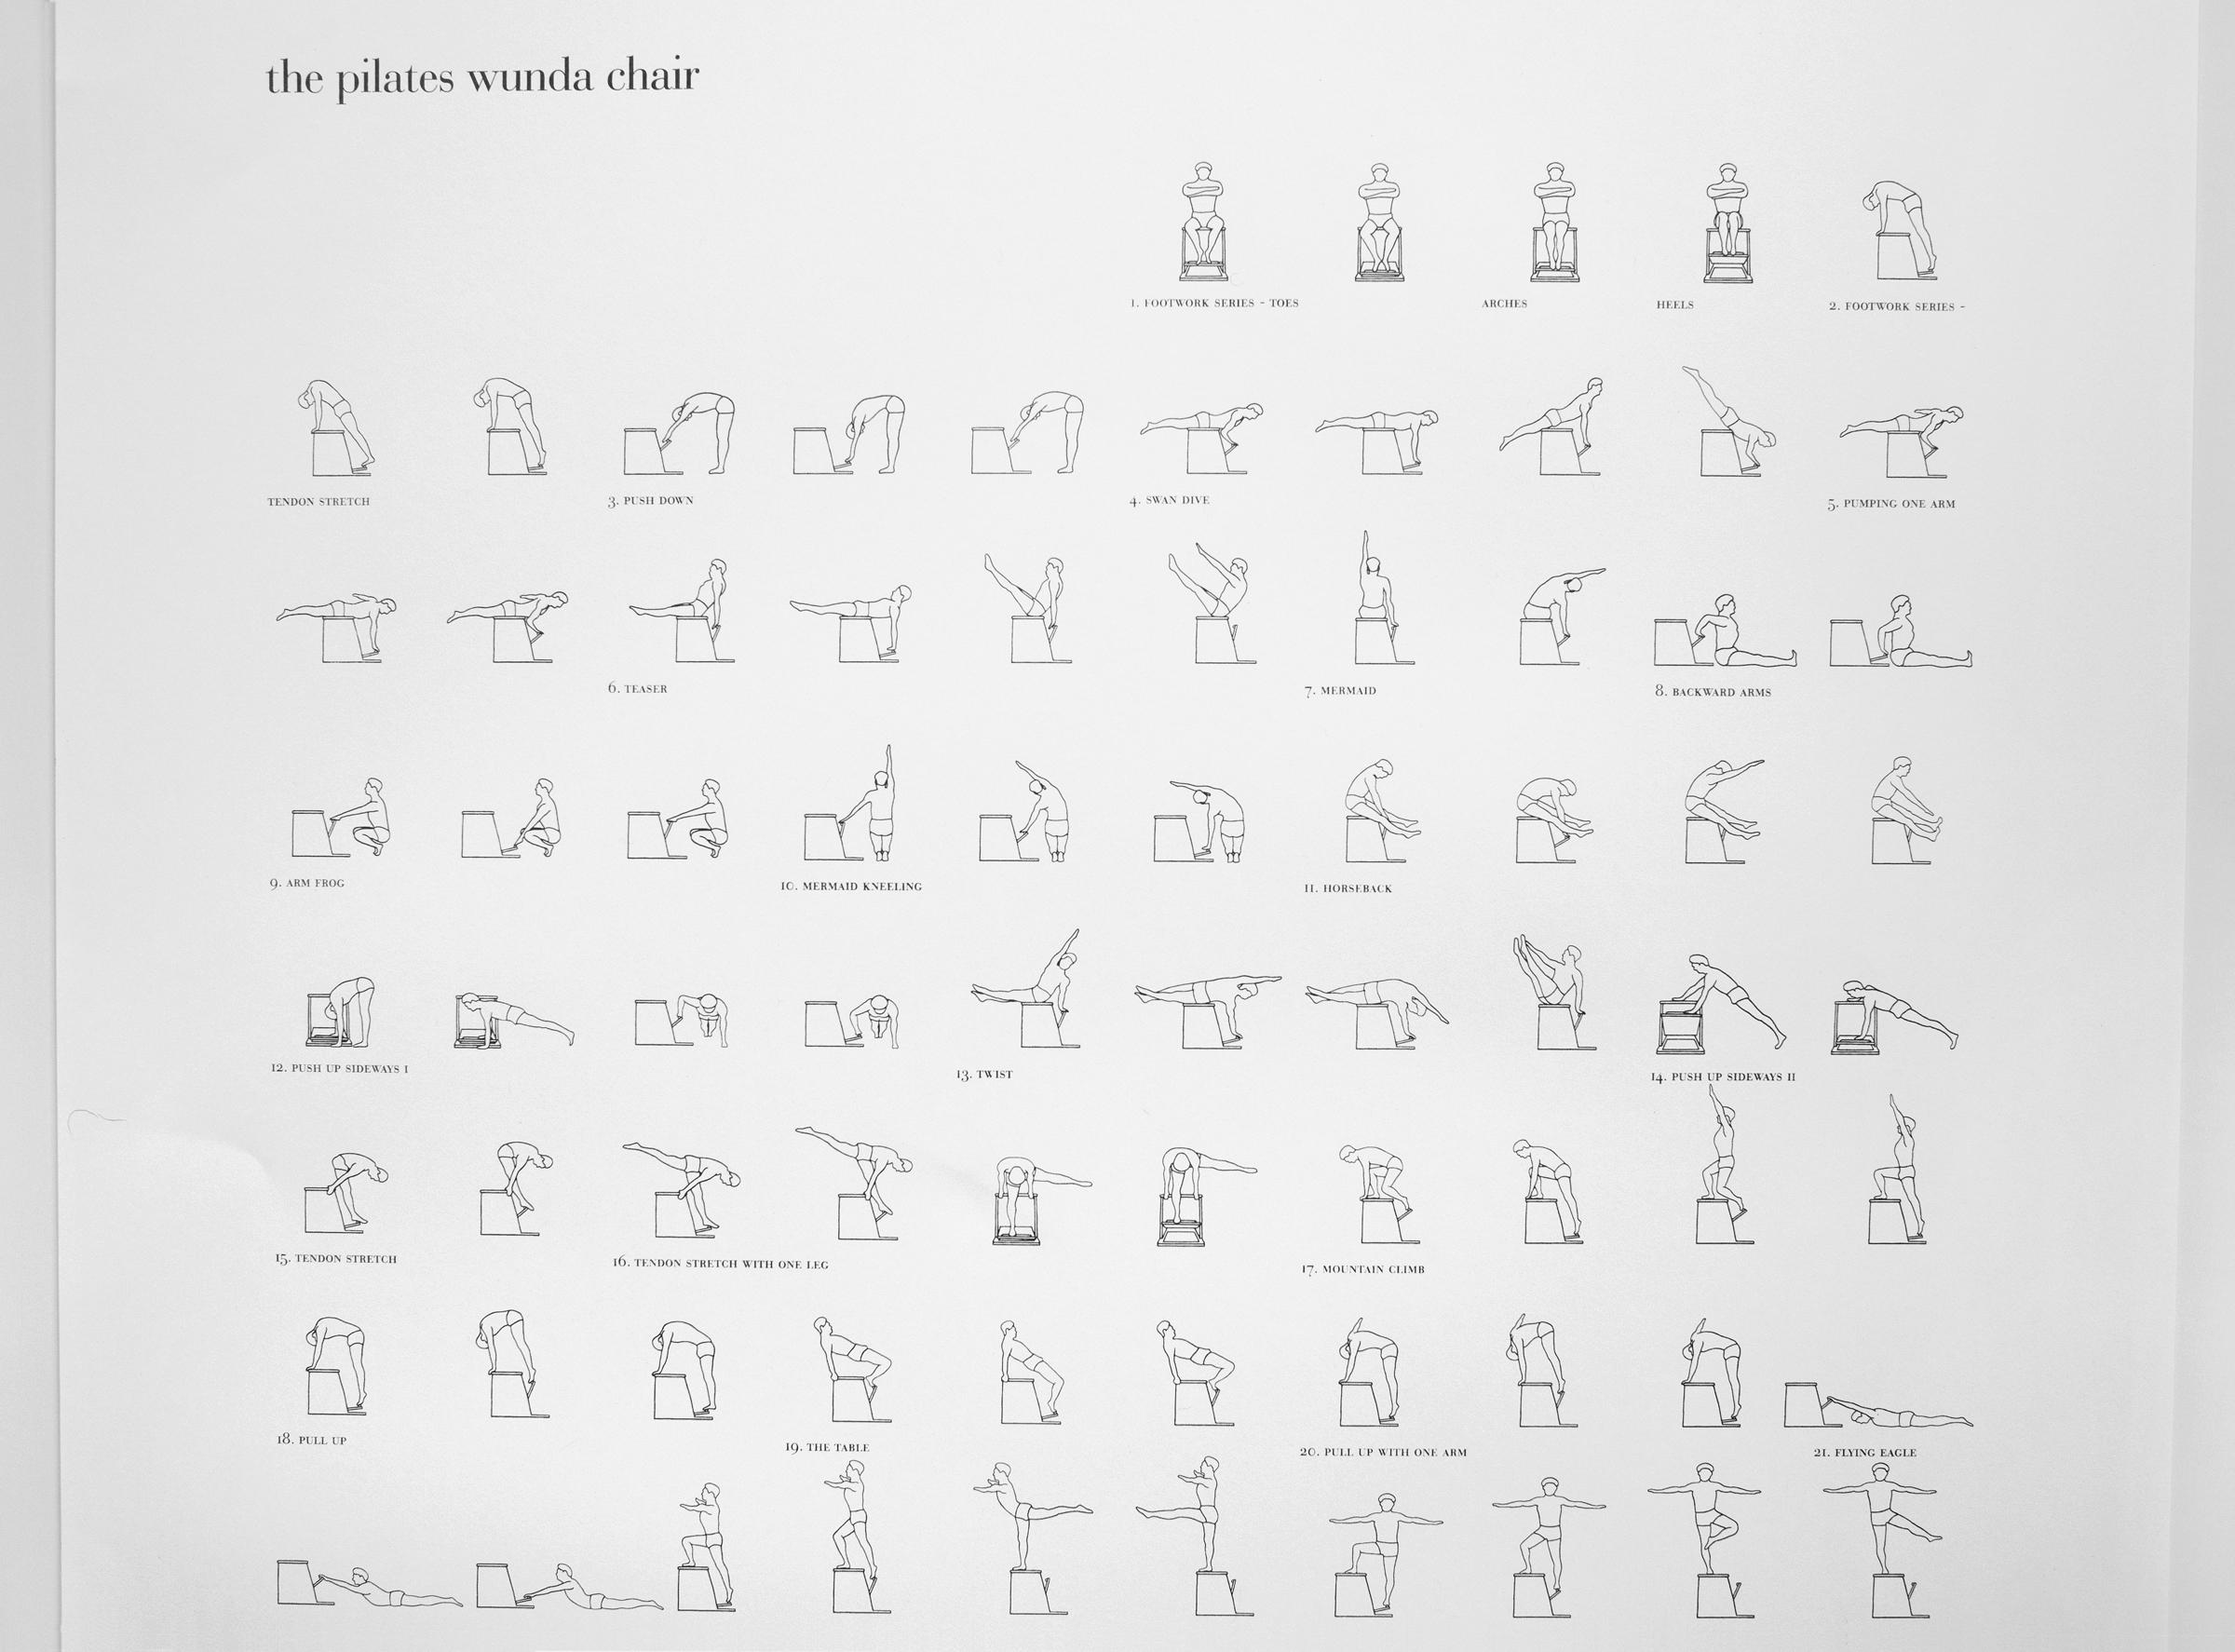 Pilates malibu chair buy malibu chair pilates combo - The Pilates Wunda Chair